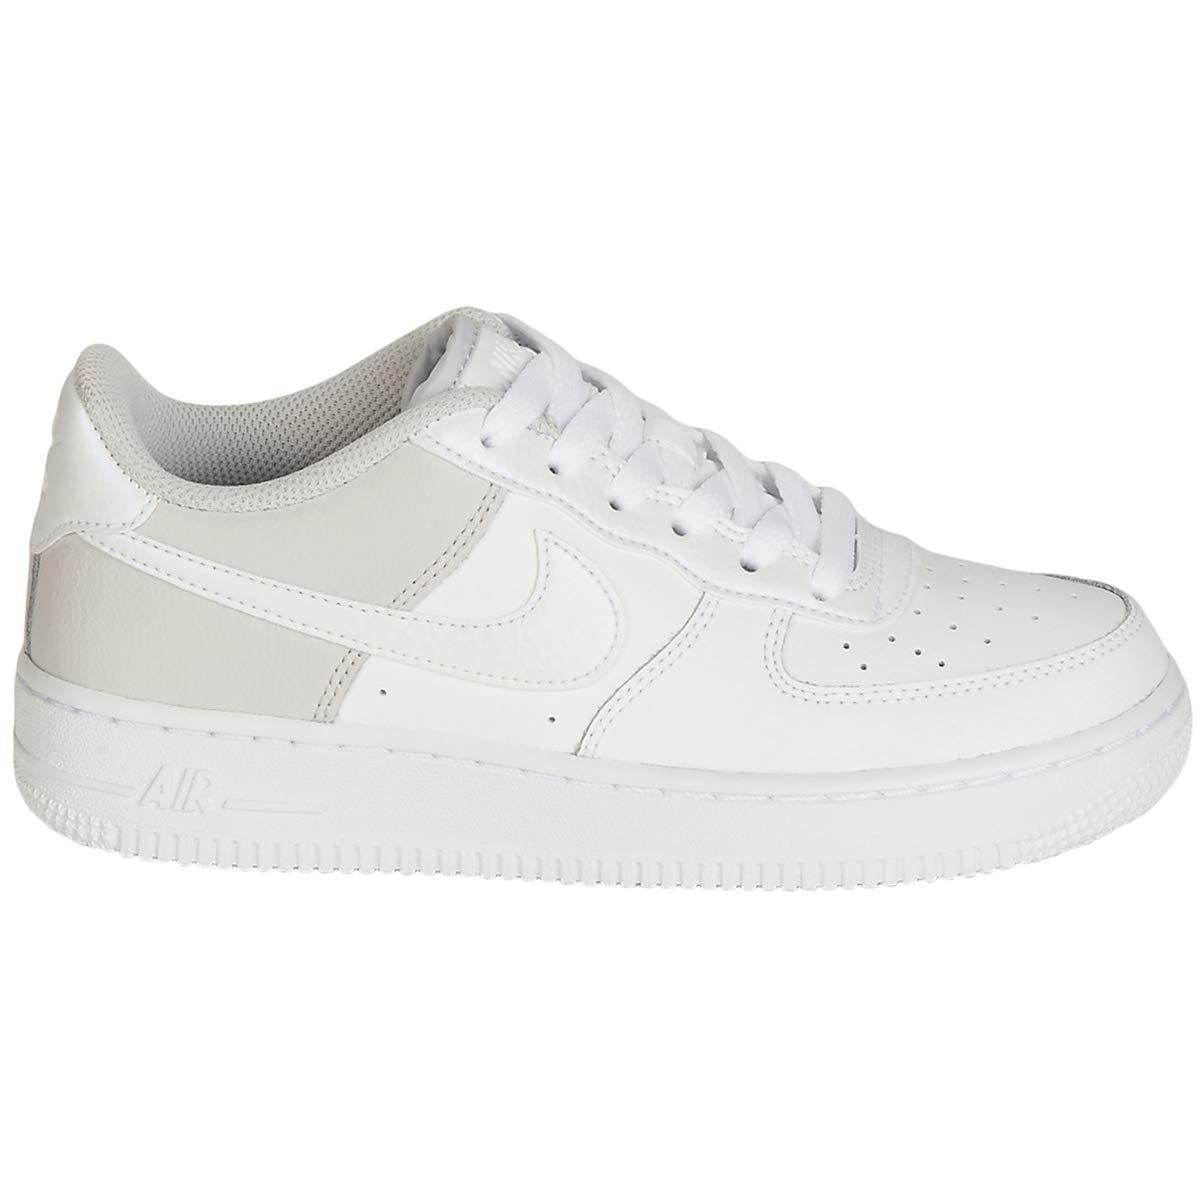 7e64a63568 Galleon - Nike Air Force 1 Youth - White Grey - 38.5 EU